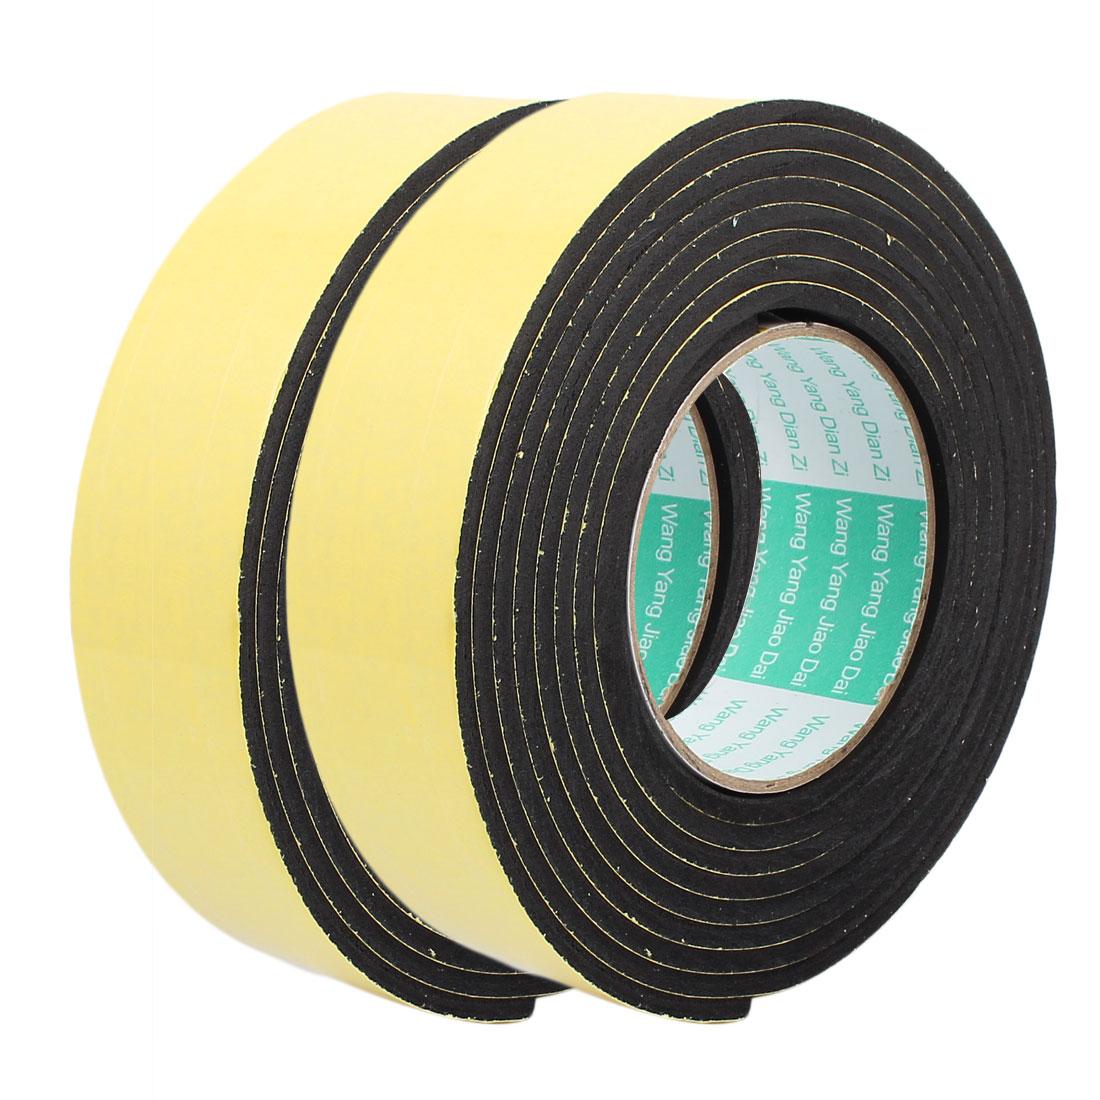 2 Pcs 3 Meter 40mm x 4mm Single-side Adhesive Shockproof Sponge Foam Tape Yellow